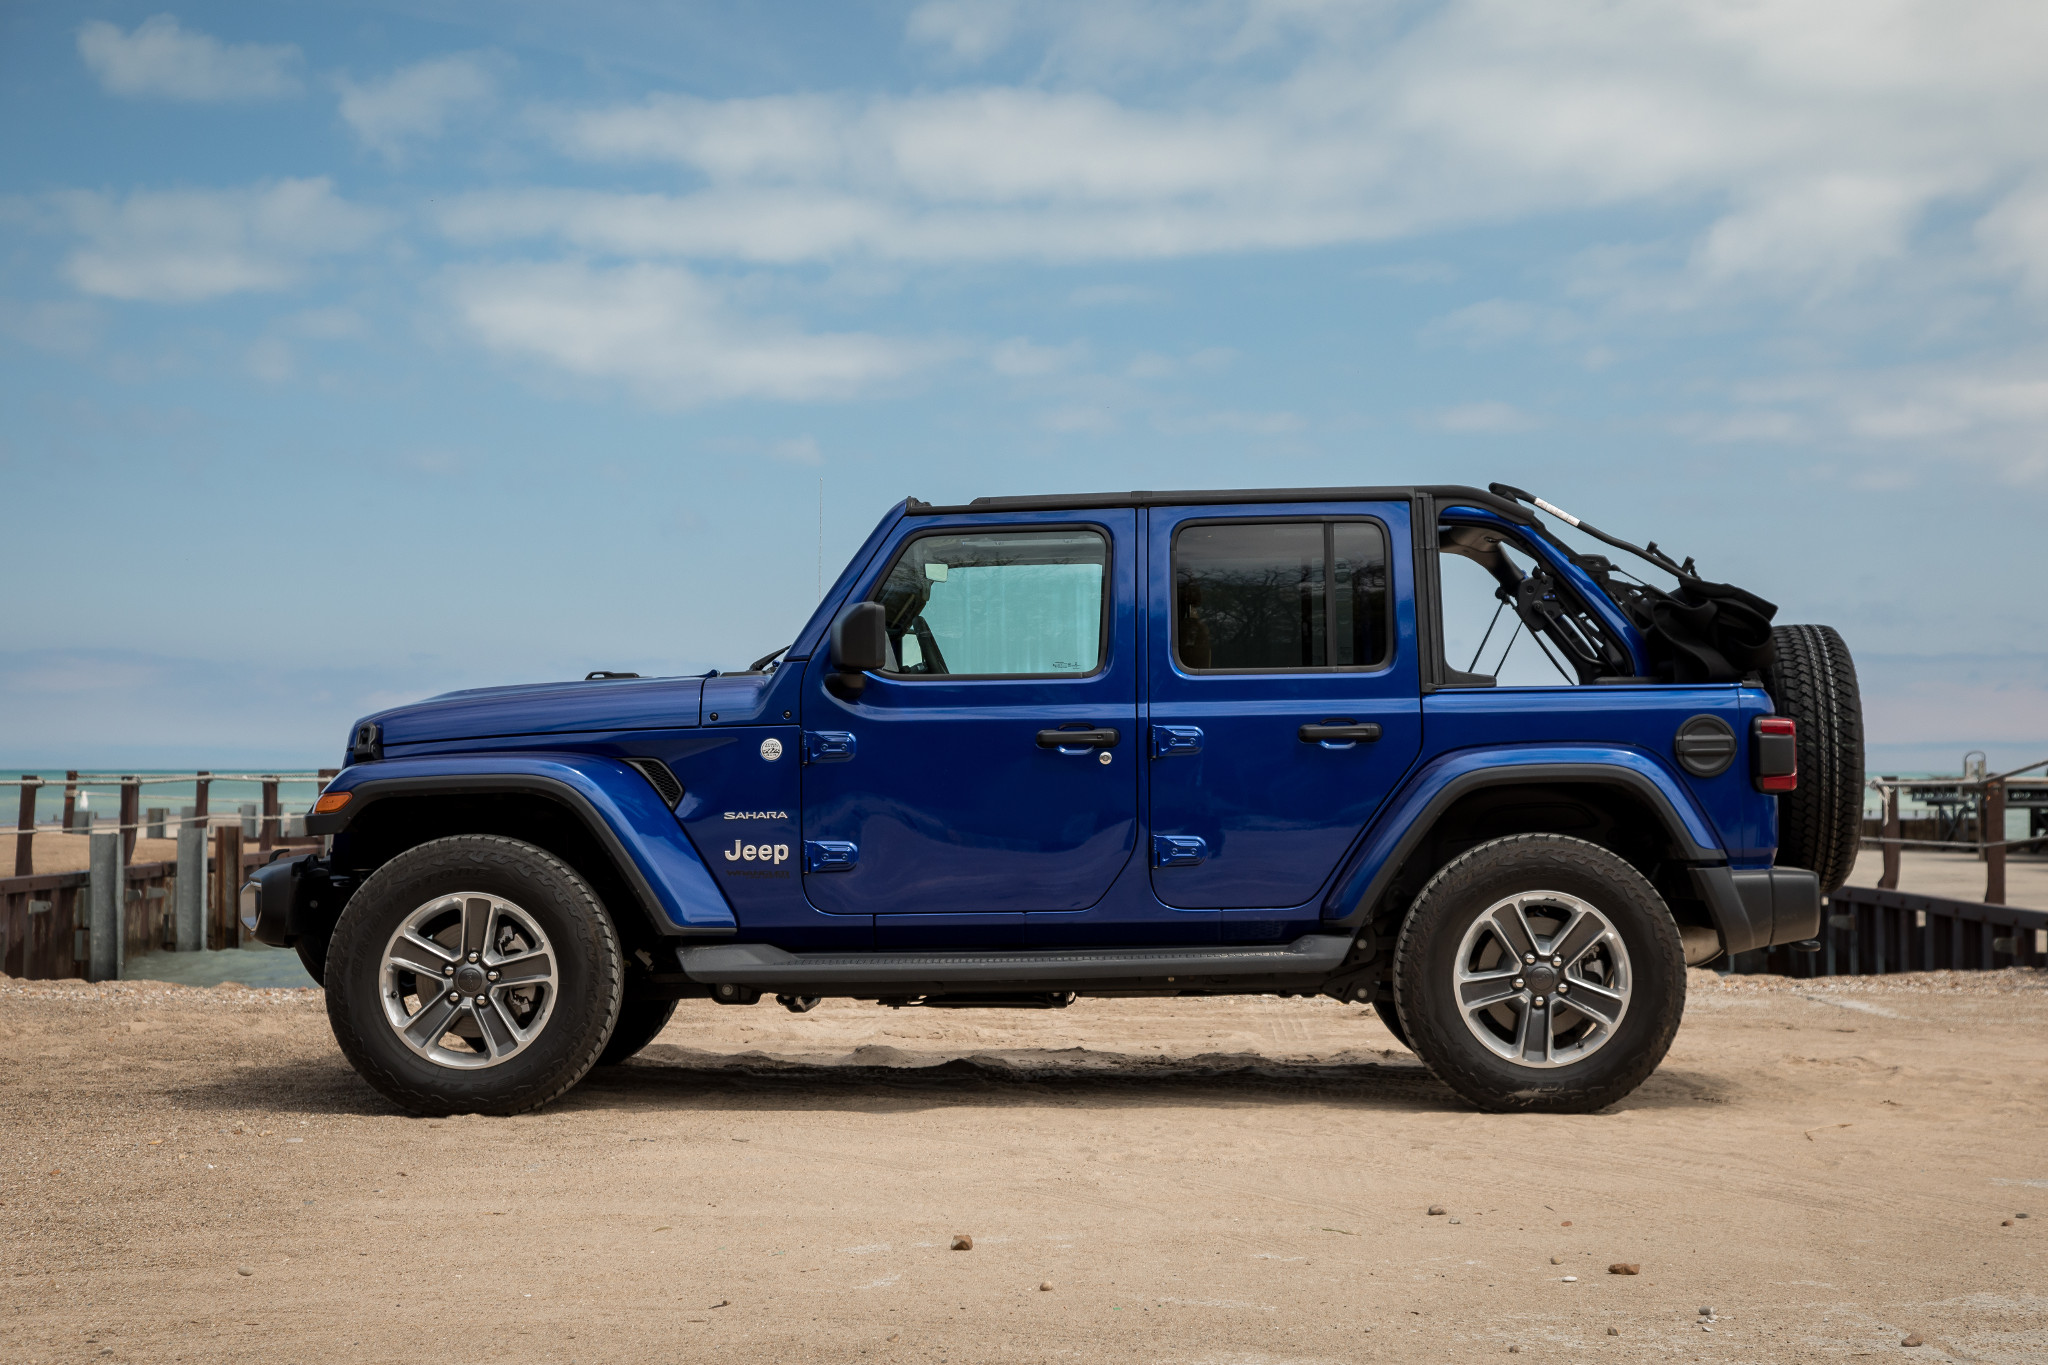 04-jeep-wrangler-2019-beach--blue--exterior--profile.jpg